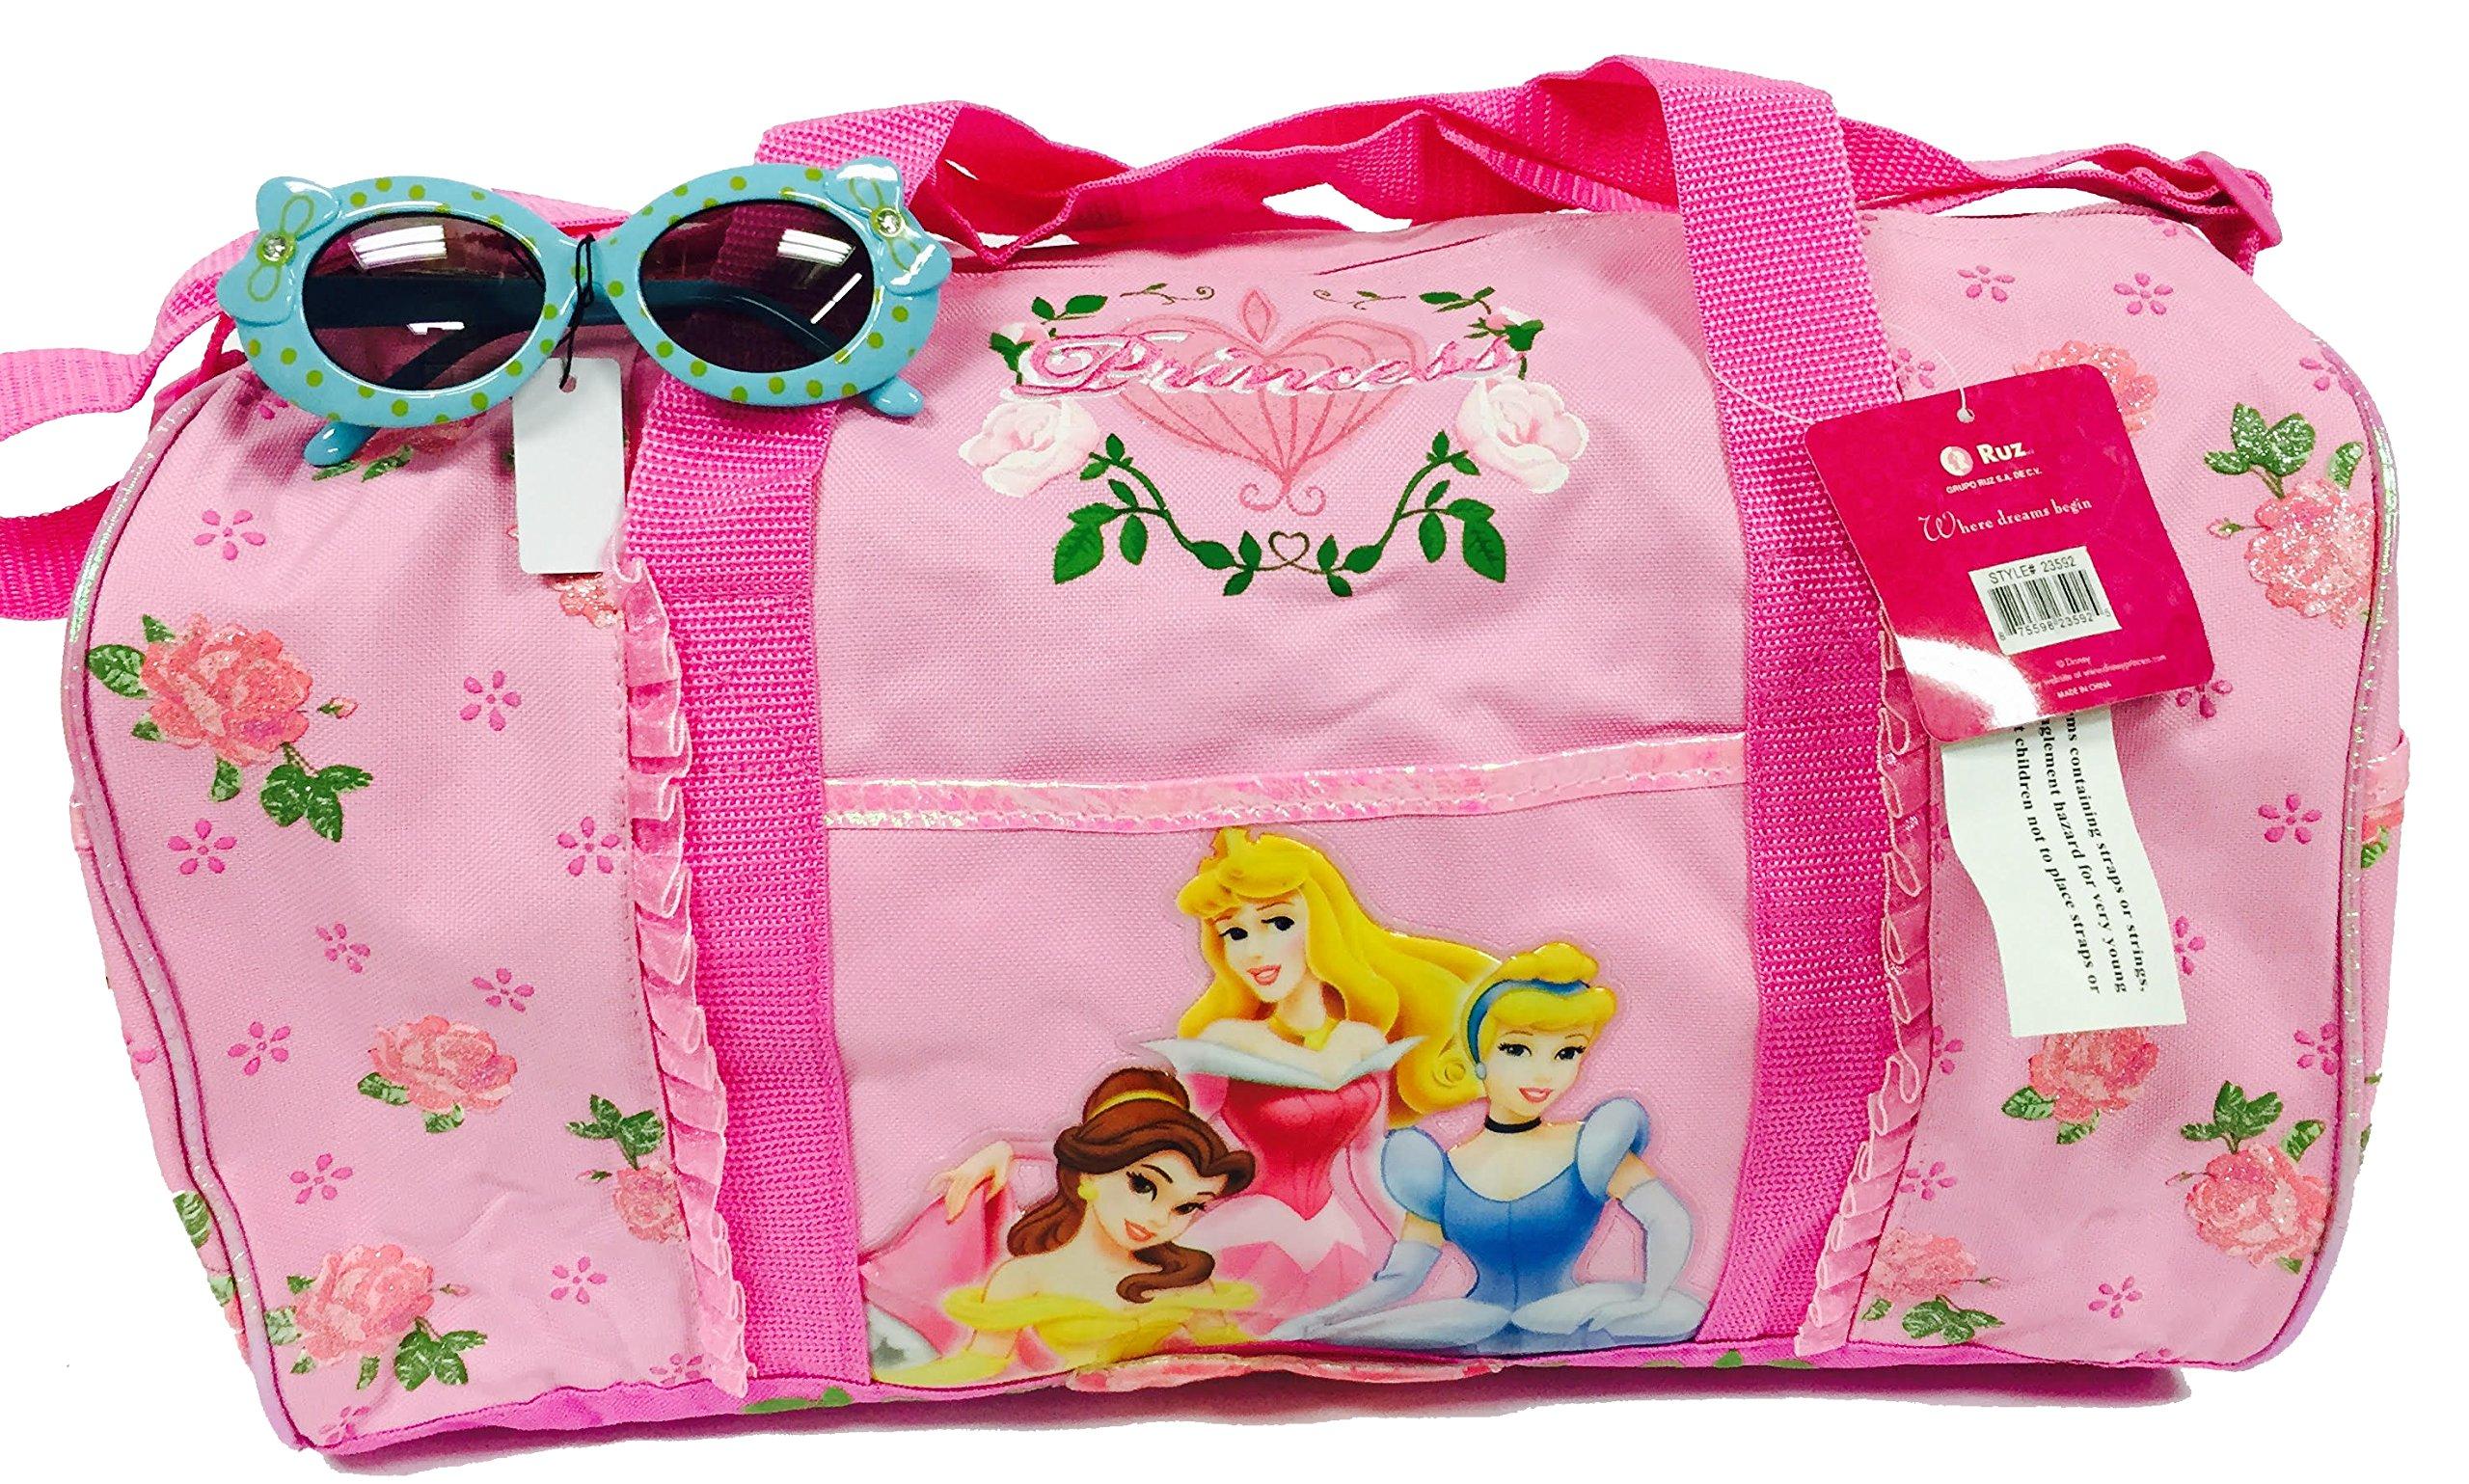 Disney Princess Duffle Diaper Bag and One Stylish Sunglasses Set